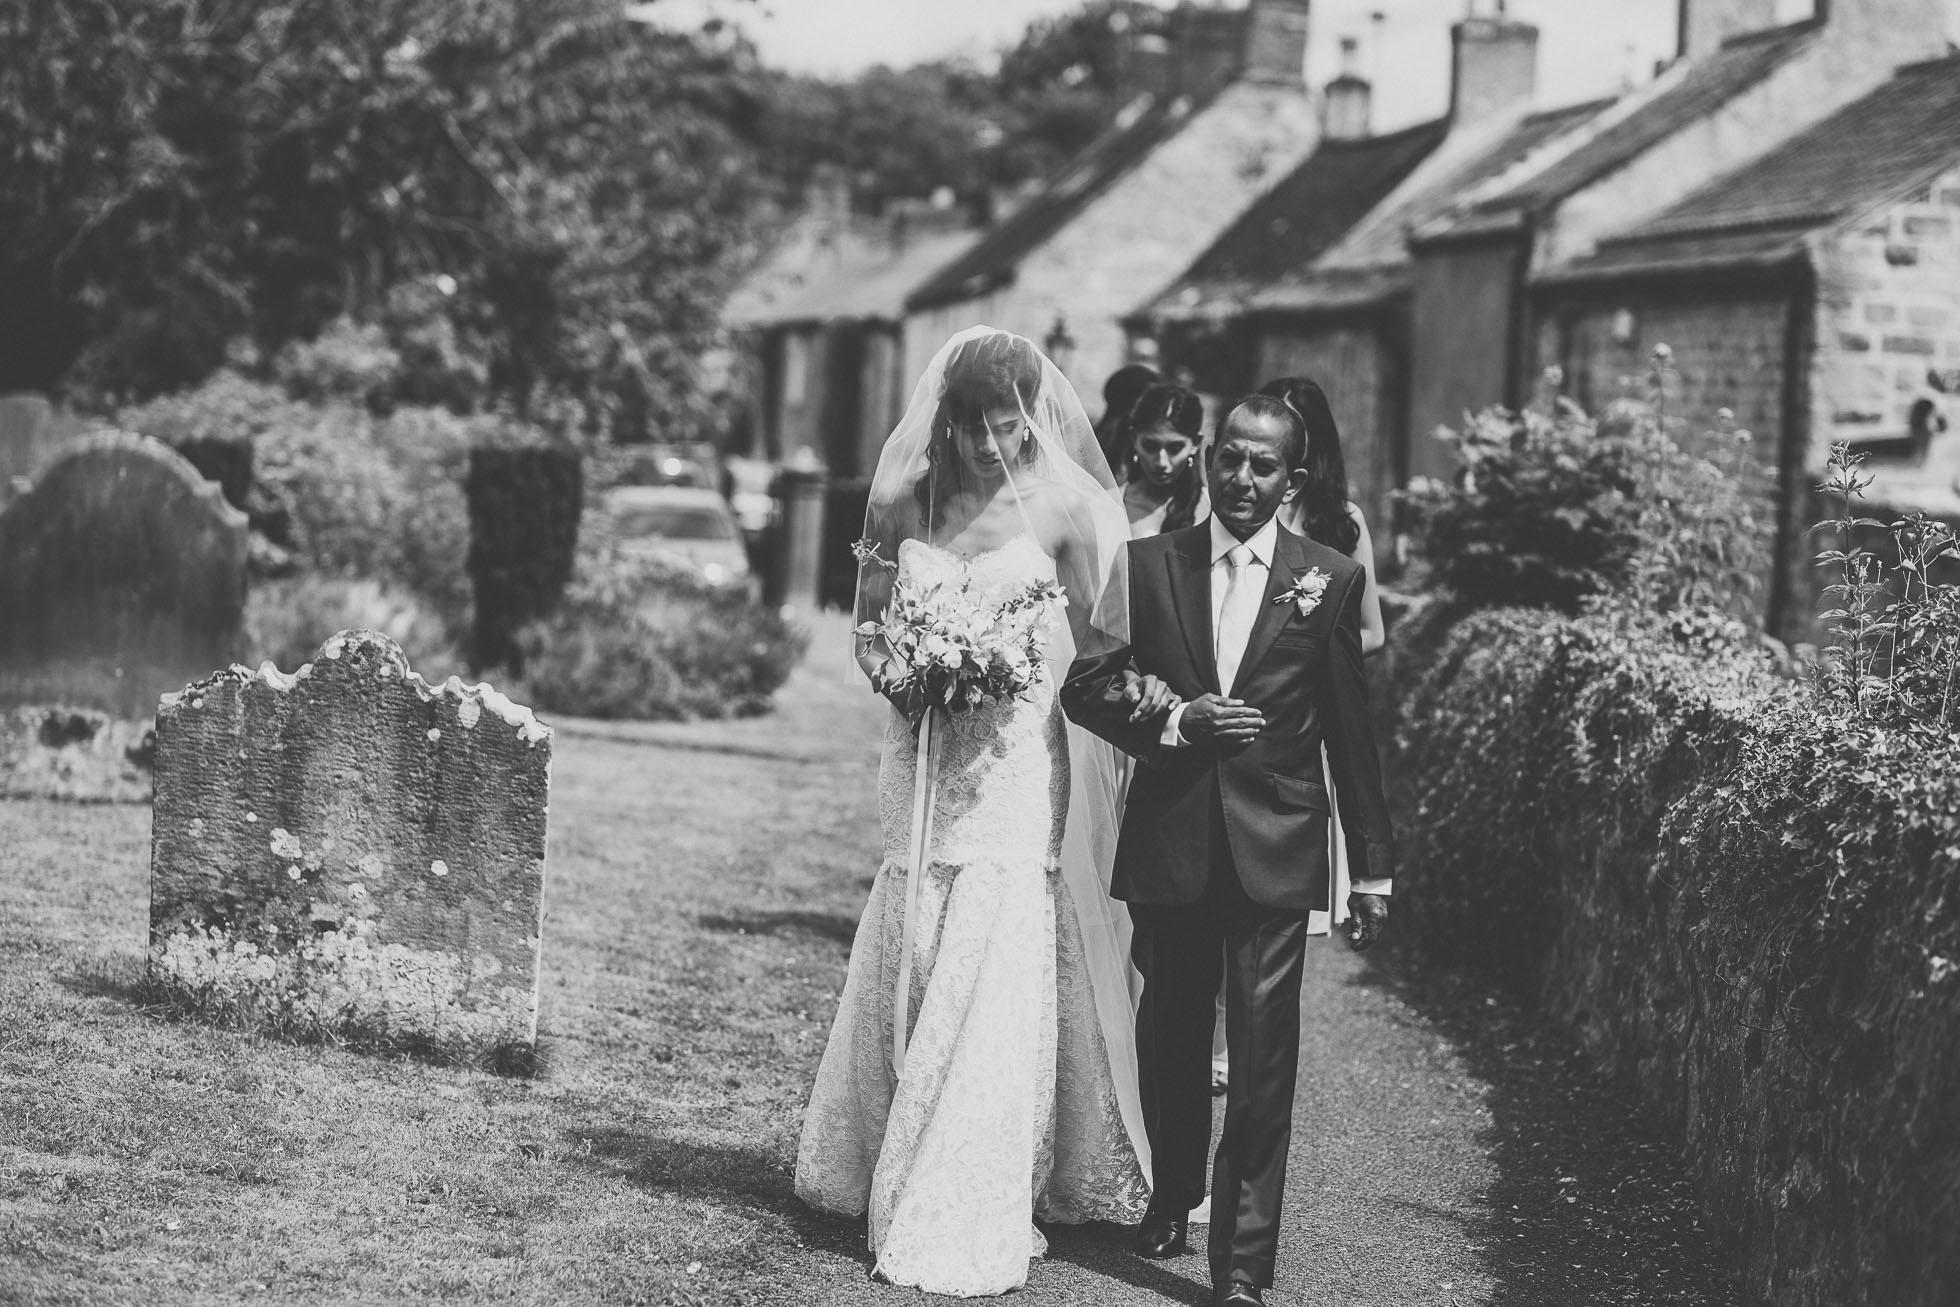 norton_conyers_wedding_photographer-17.jpg